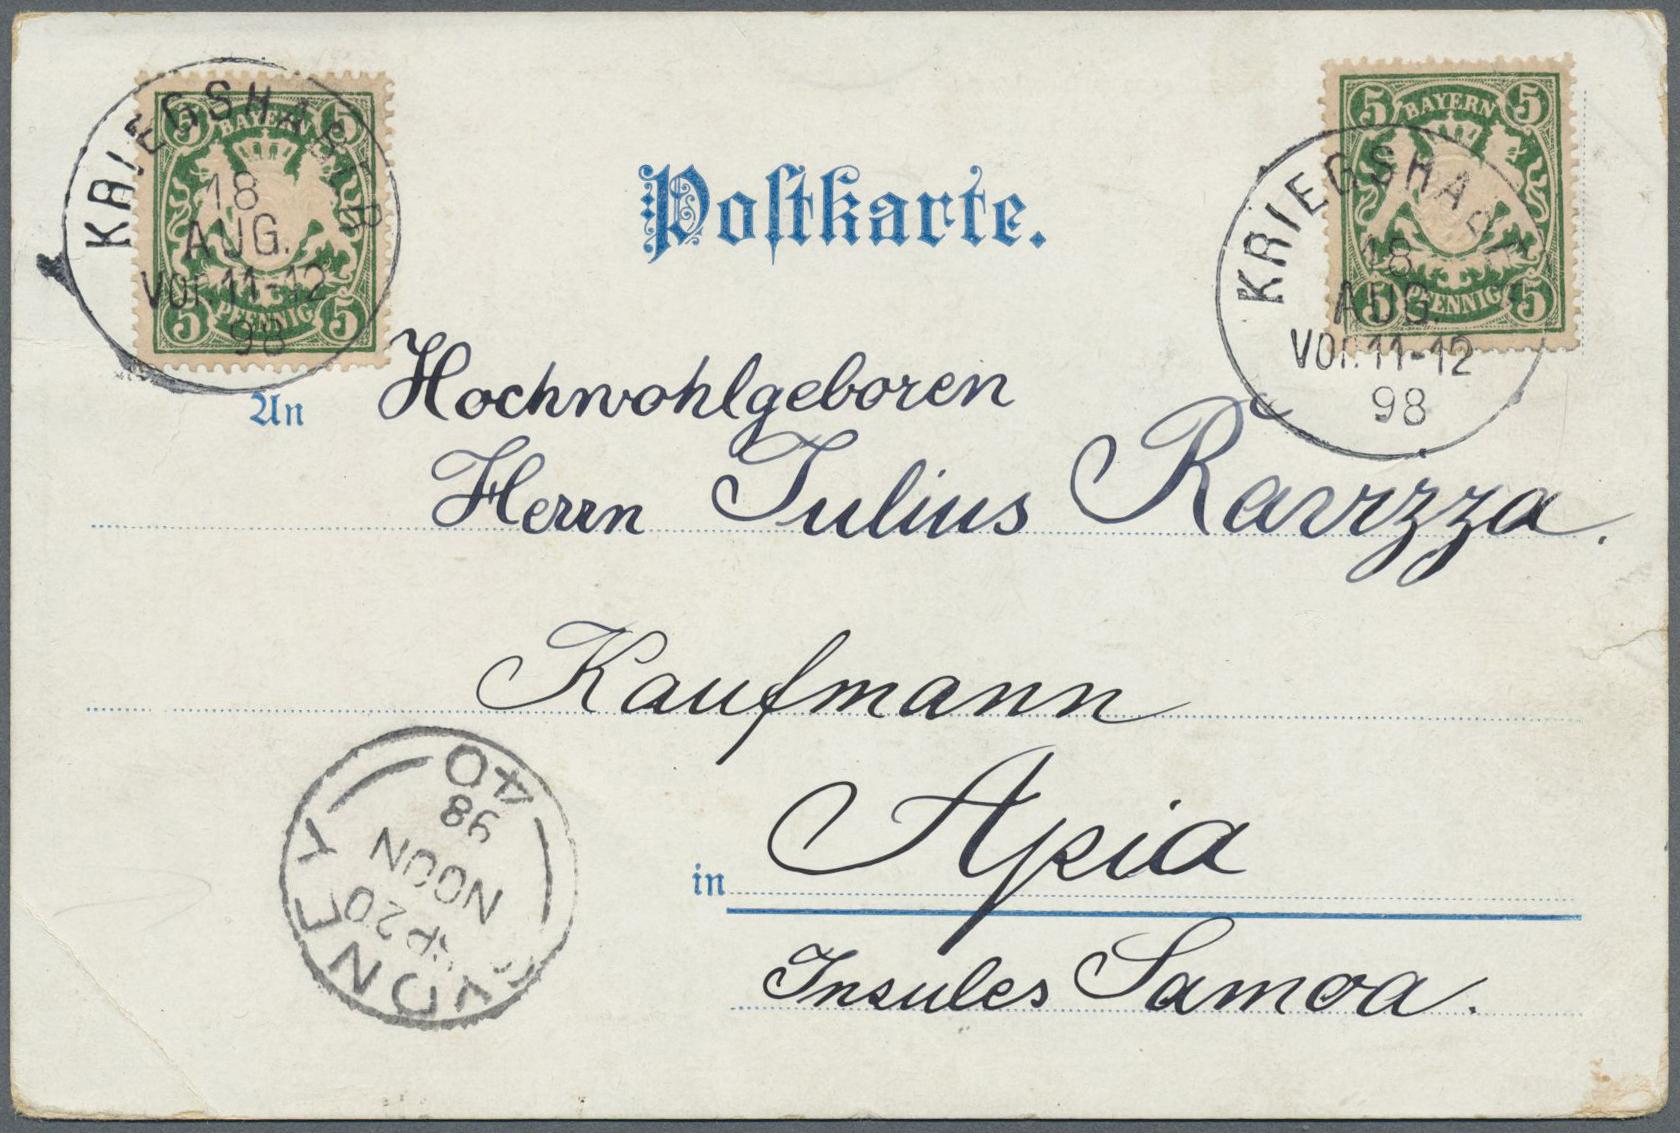 Lot 37196 - Deutsche Auslandspostämter + Kolonien  -  Auktionshaus Christoph Gärtner GmbH & Co. KG Collections Germany,  Collections Supplement, Surprise boxes #39 Day 7